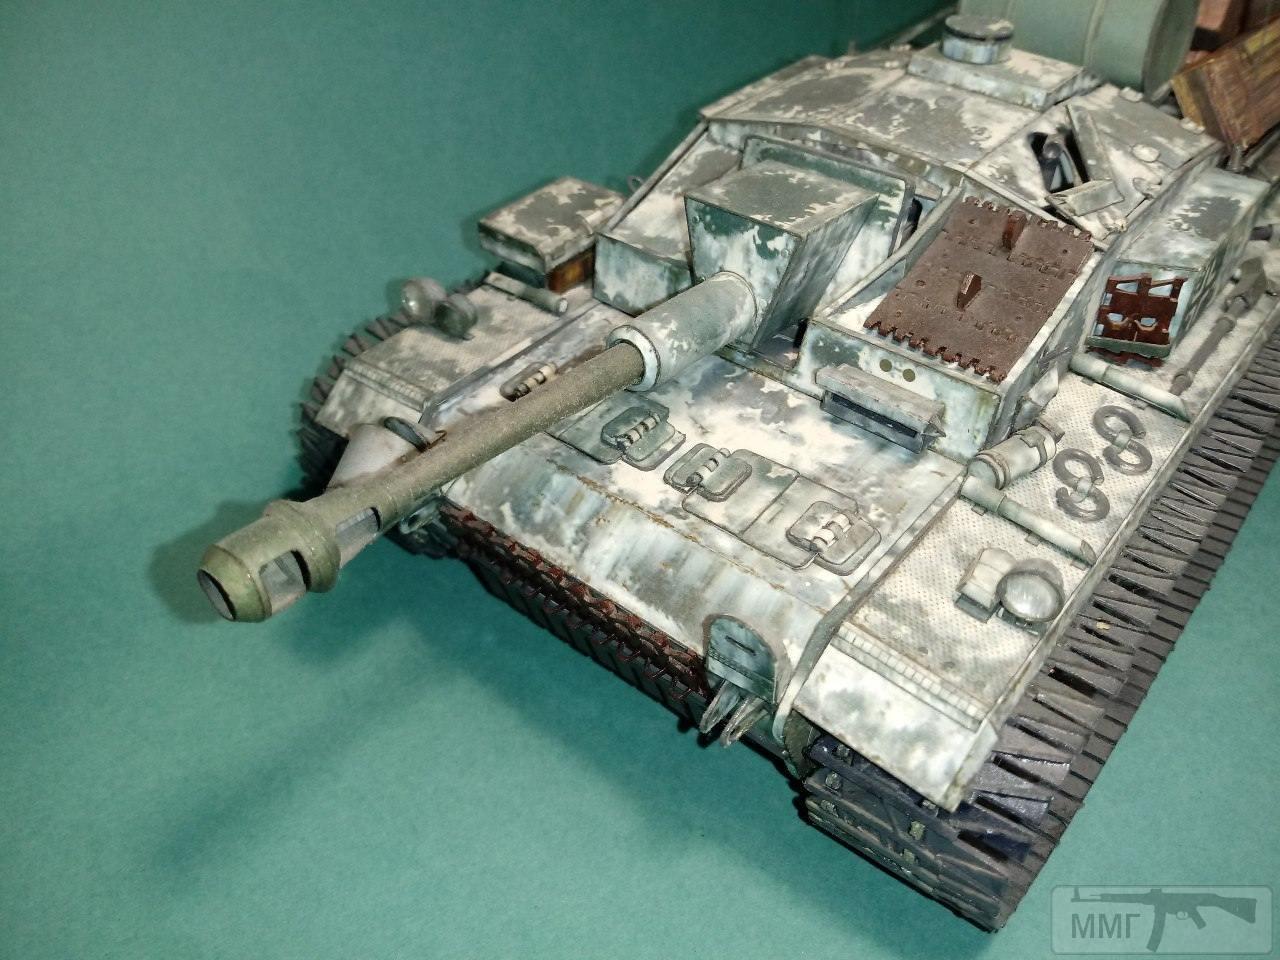 20408 - StuG III. 1/25. Бумага.